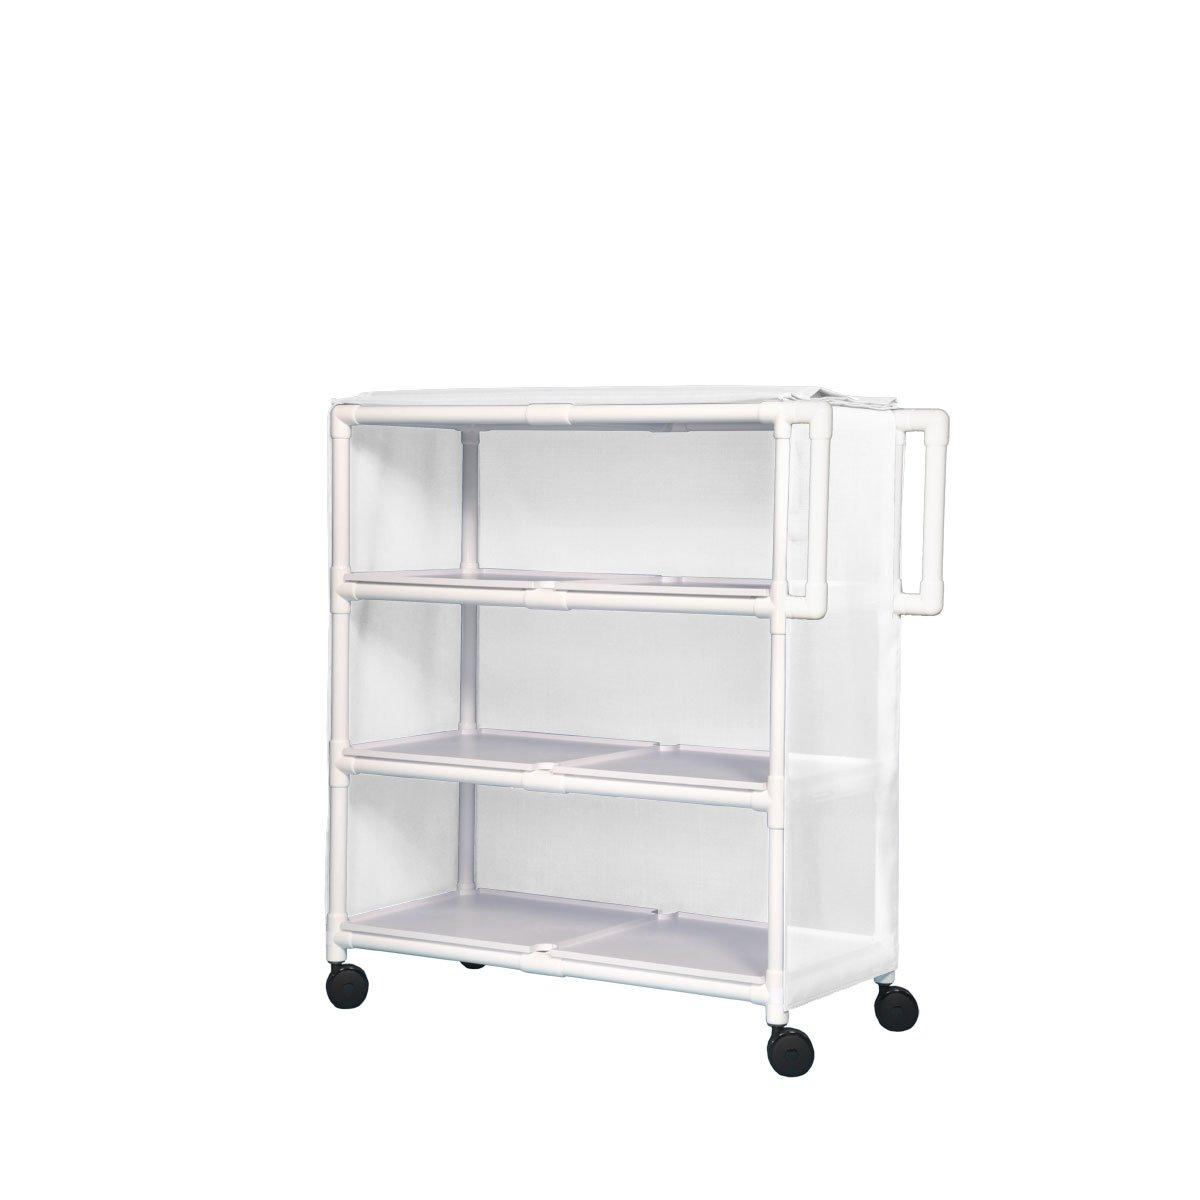 Jumbo Linen Cart - Soldering Three Max 58% OFF White Shelves Chek Sure